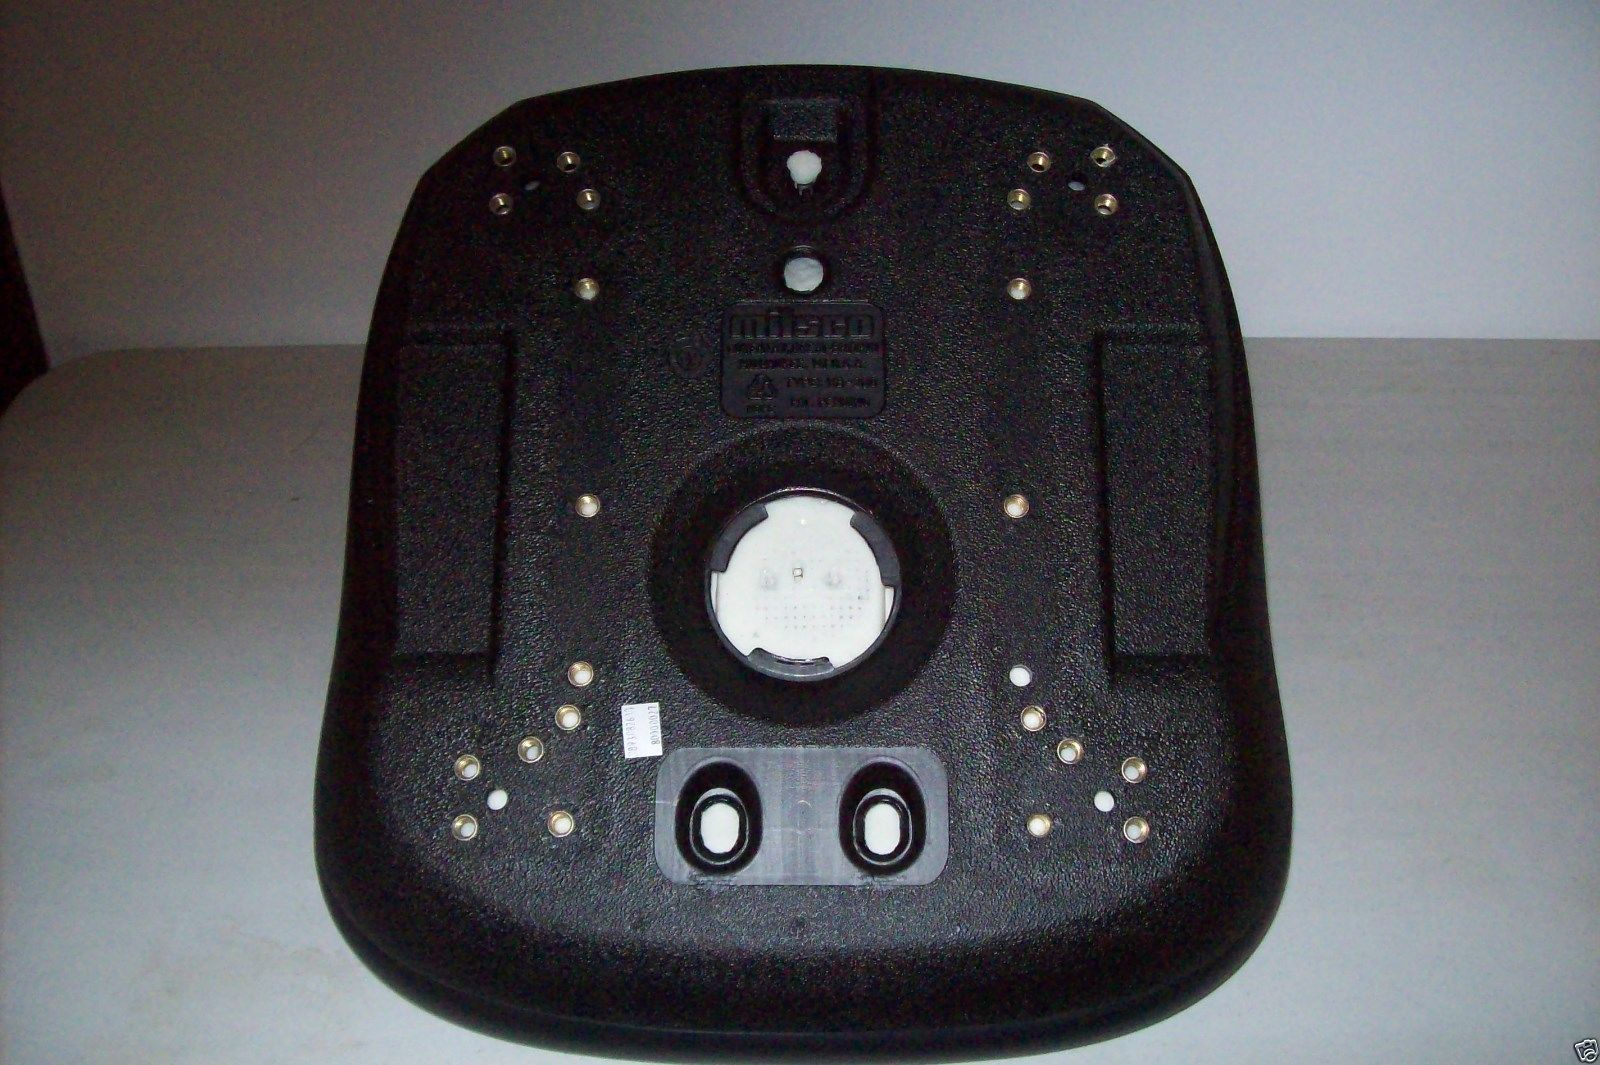 Black Seat 260 270 280 313 315 317 325 328 332 Ct315 John 332d Skid Loader Wiring Schematic Deere Steer Bb